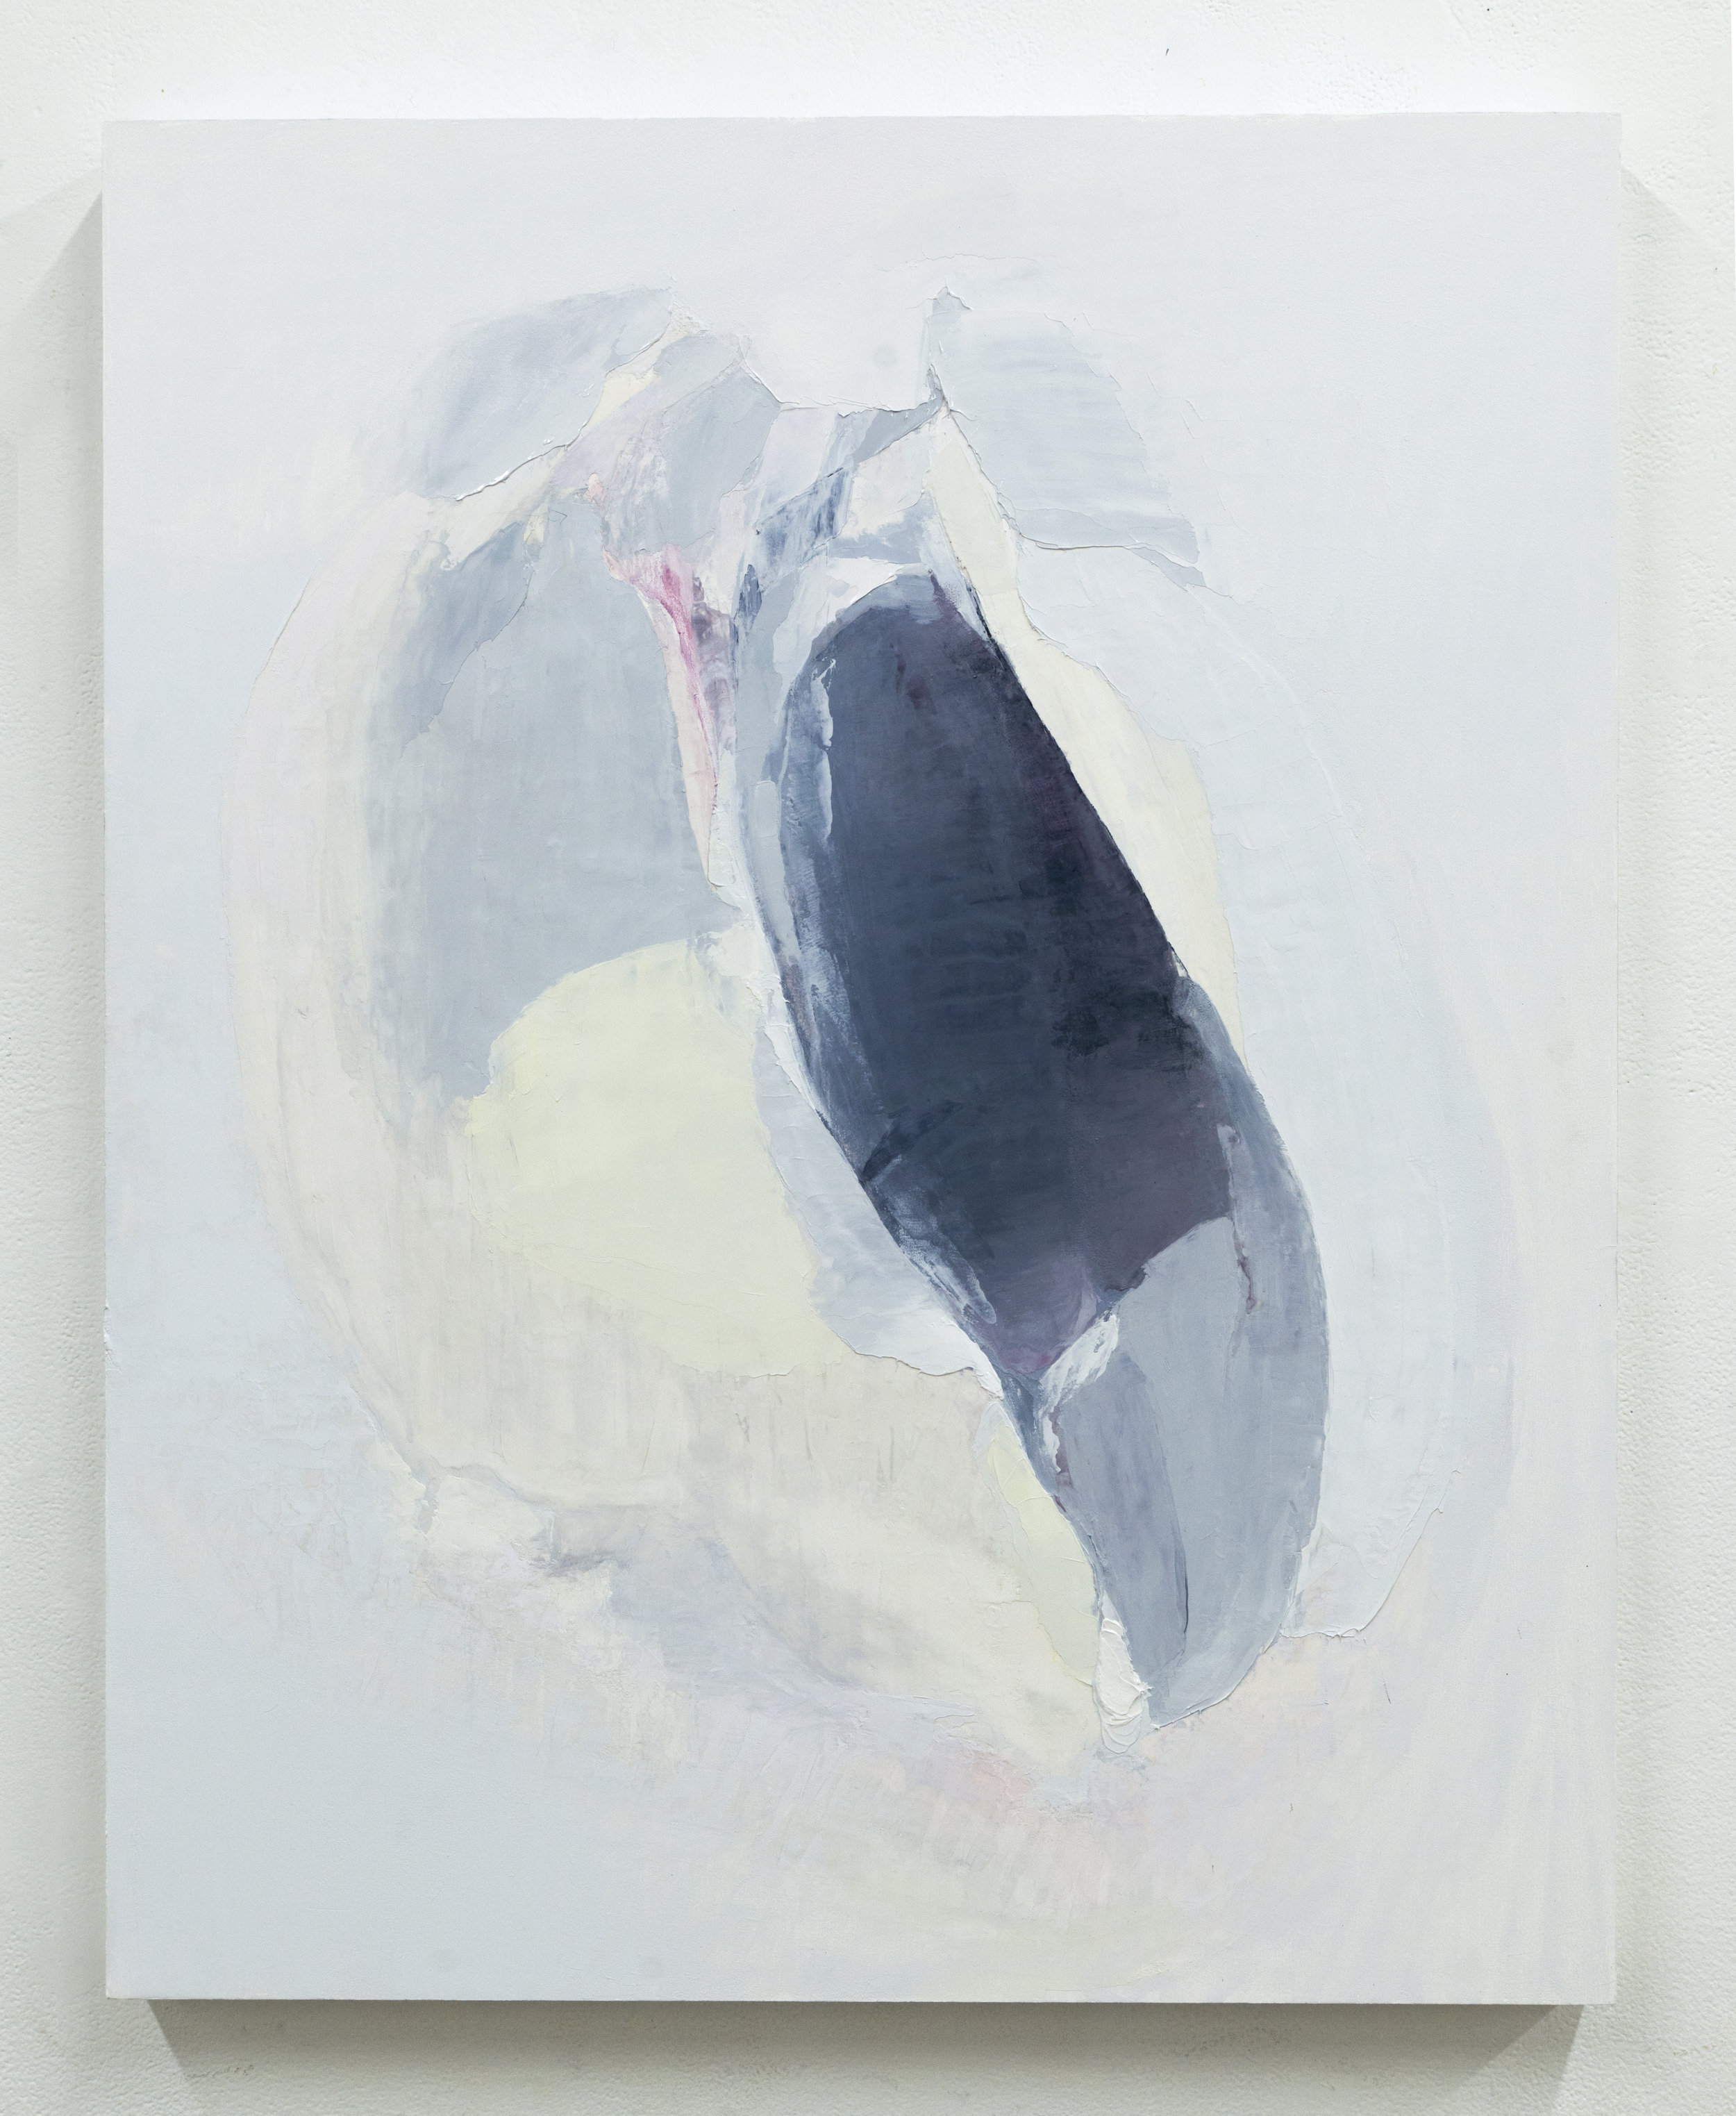 Untitled (Cavity II), 2017